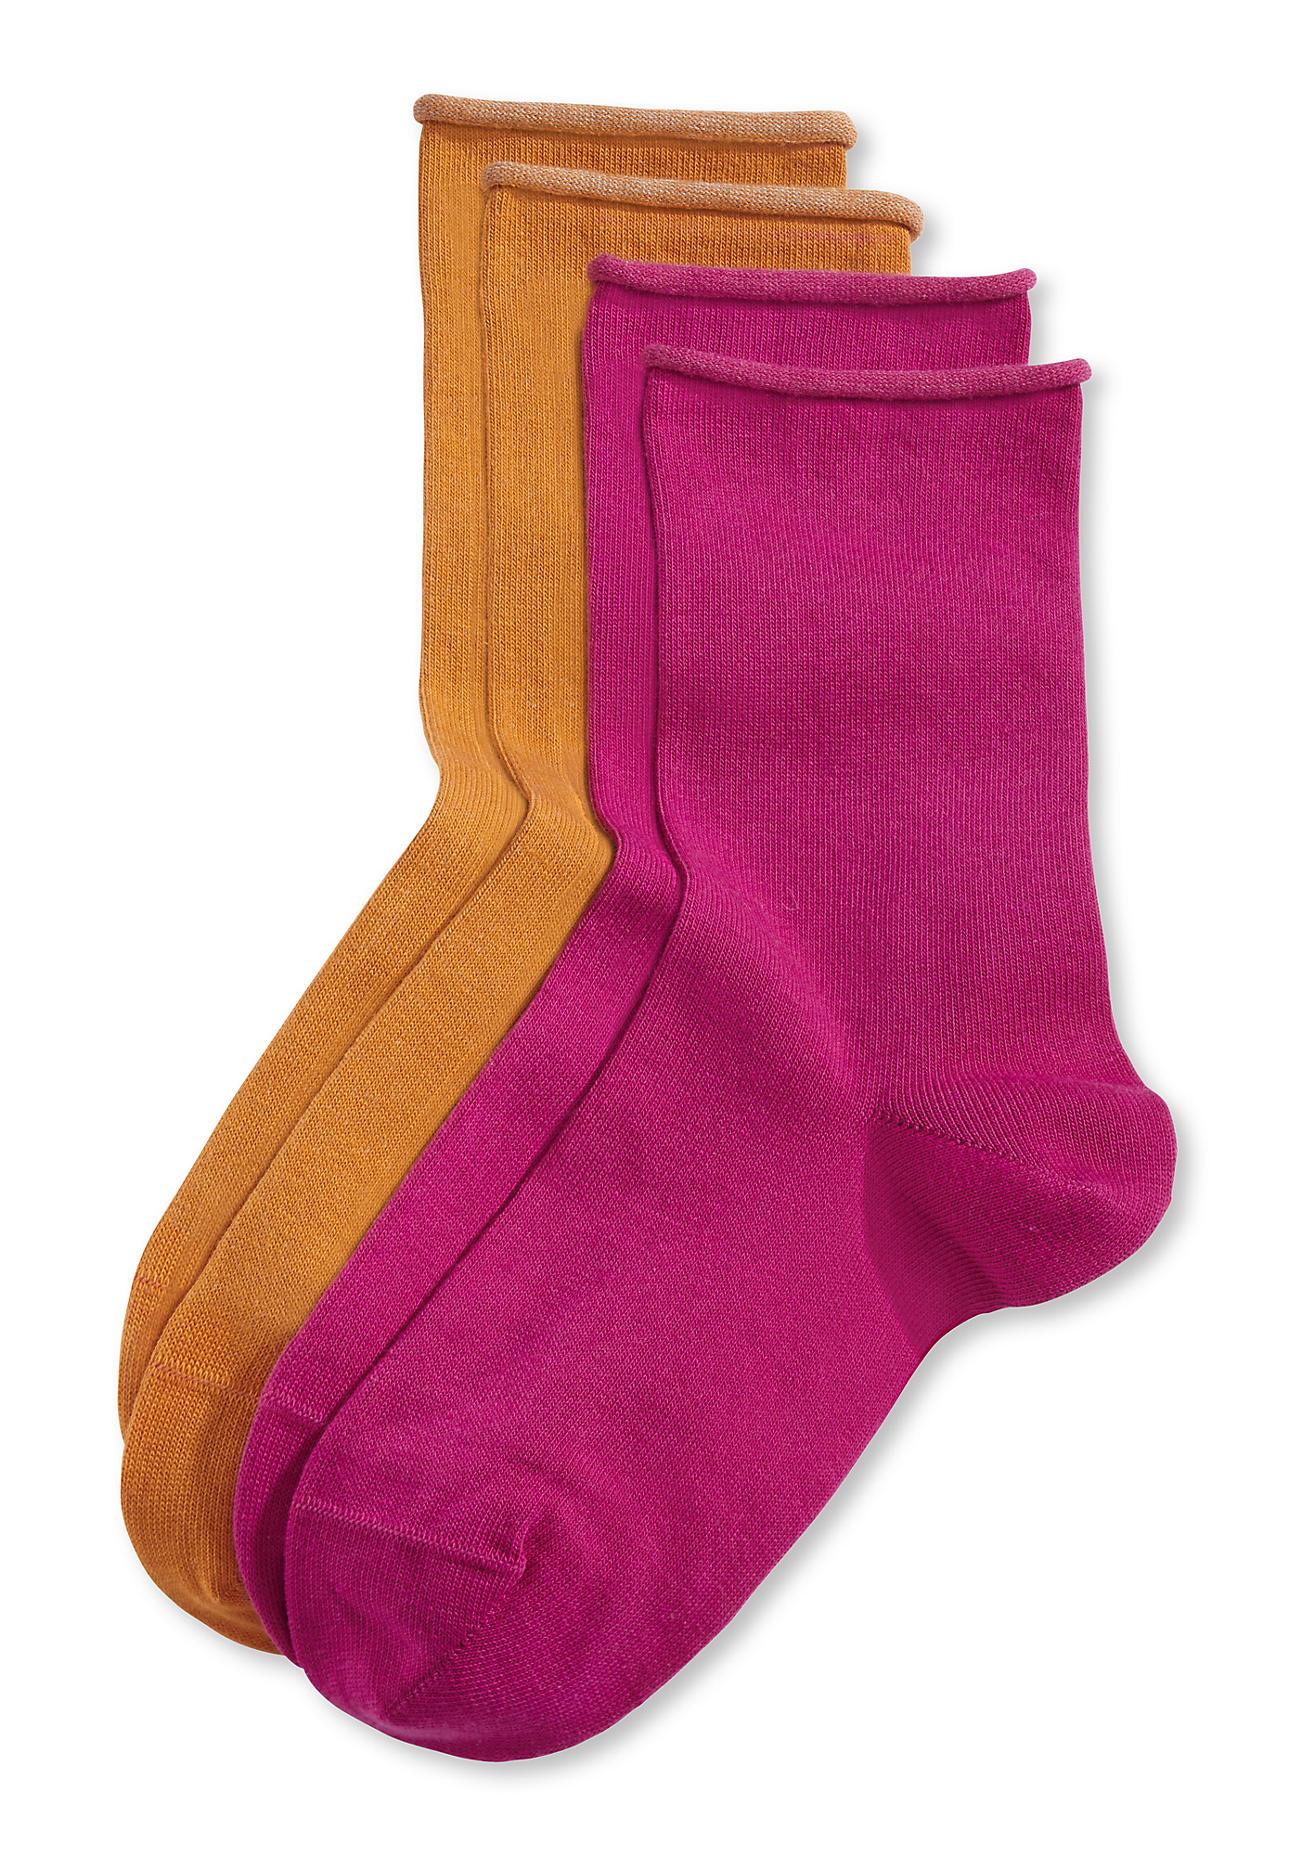 hessnatur Damen Socke im 2er Pack aus Bio Baumwolle – lila – Größe 38 39